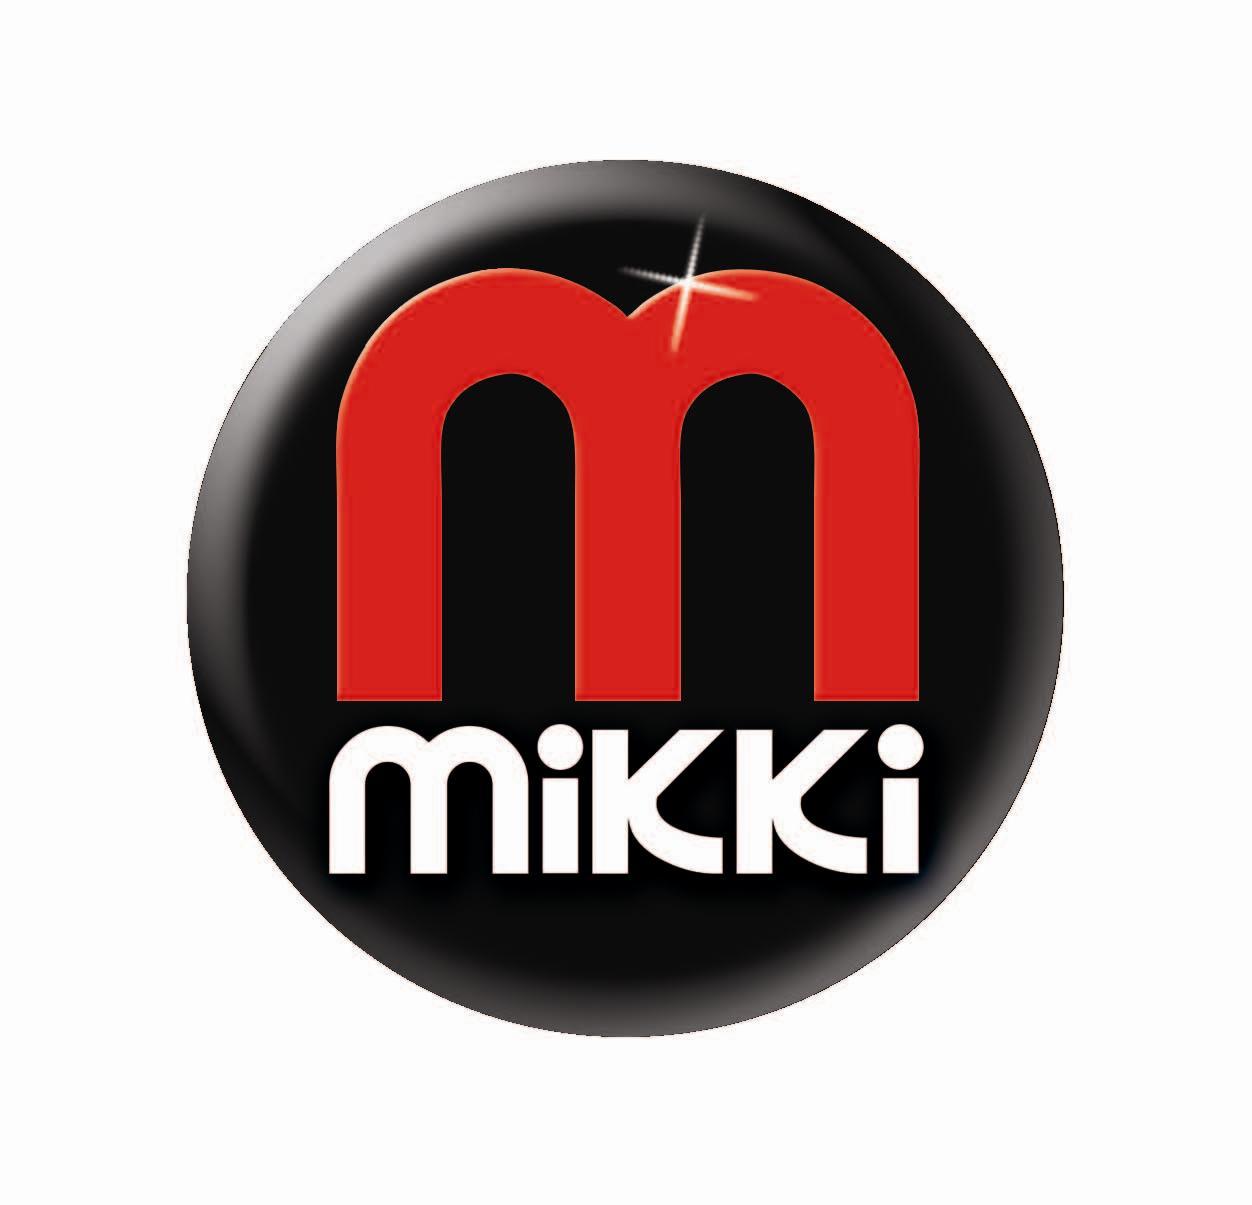 MIKKI logo JPG